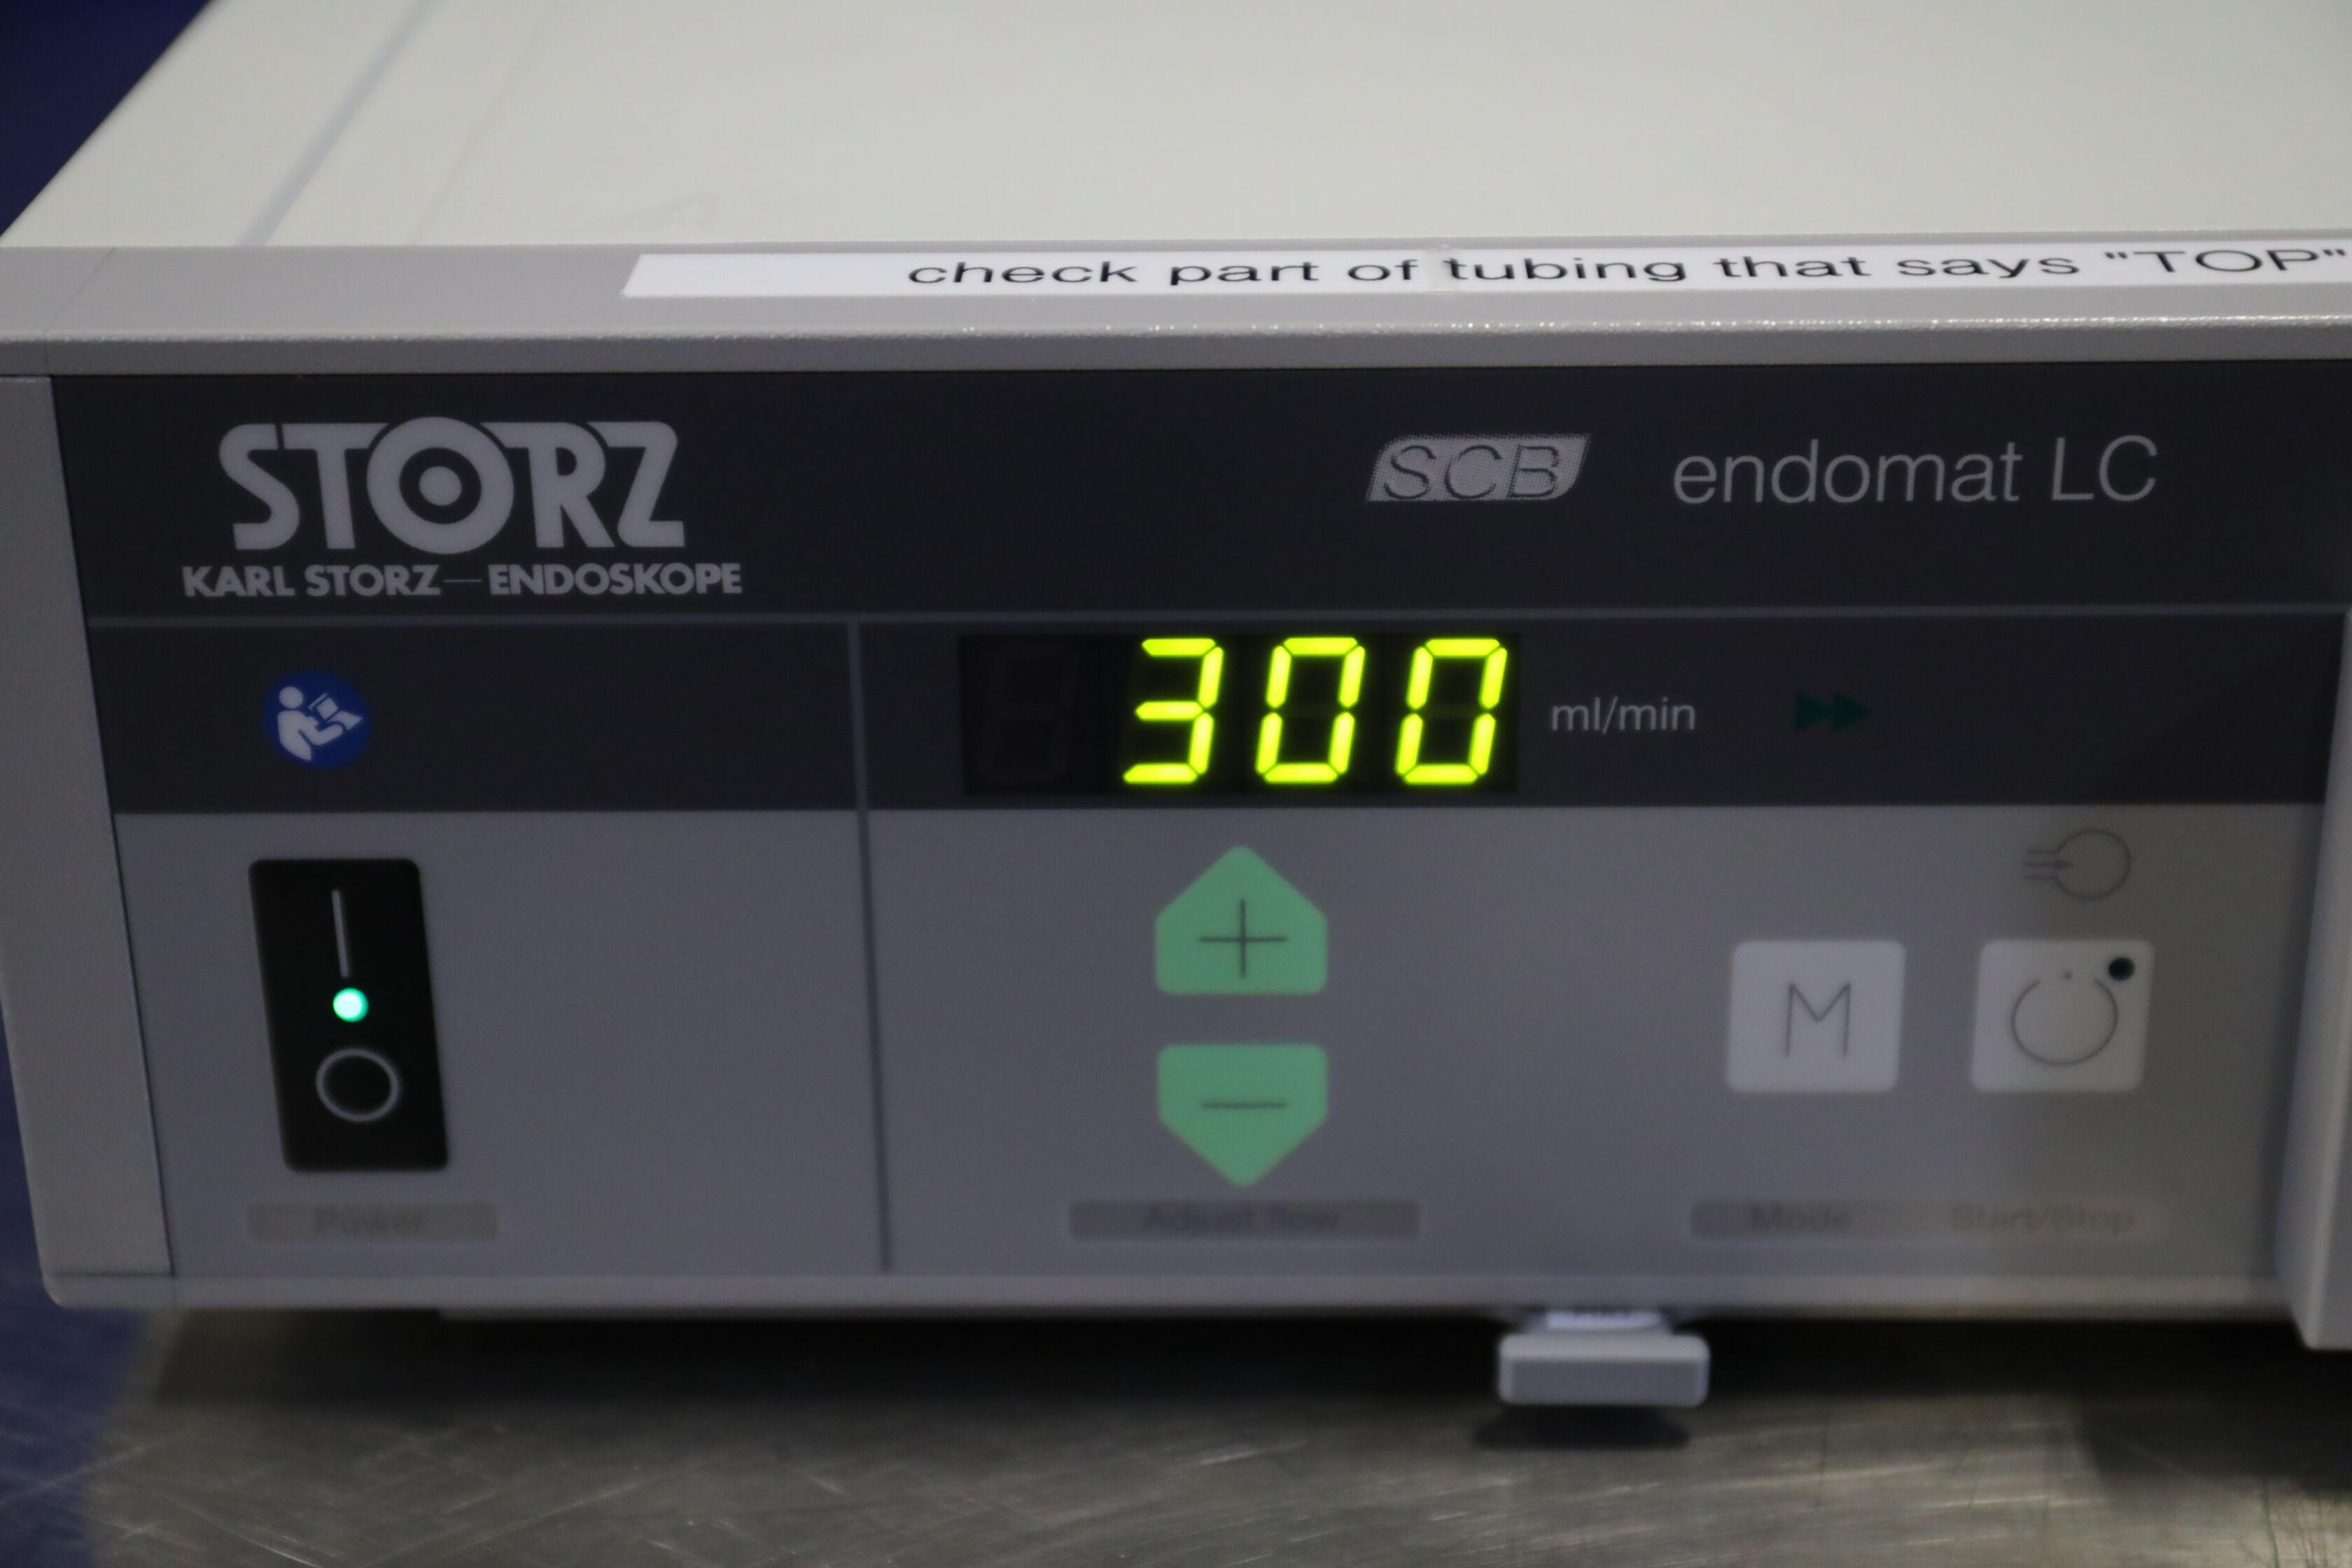 KARL STORZ 20330320-1 Endomat LC Roller Pump